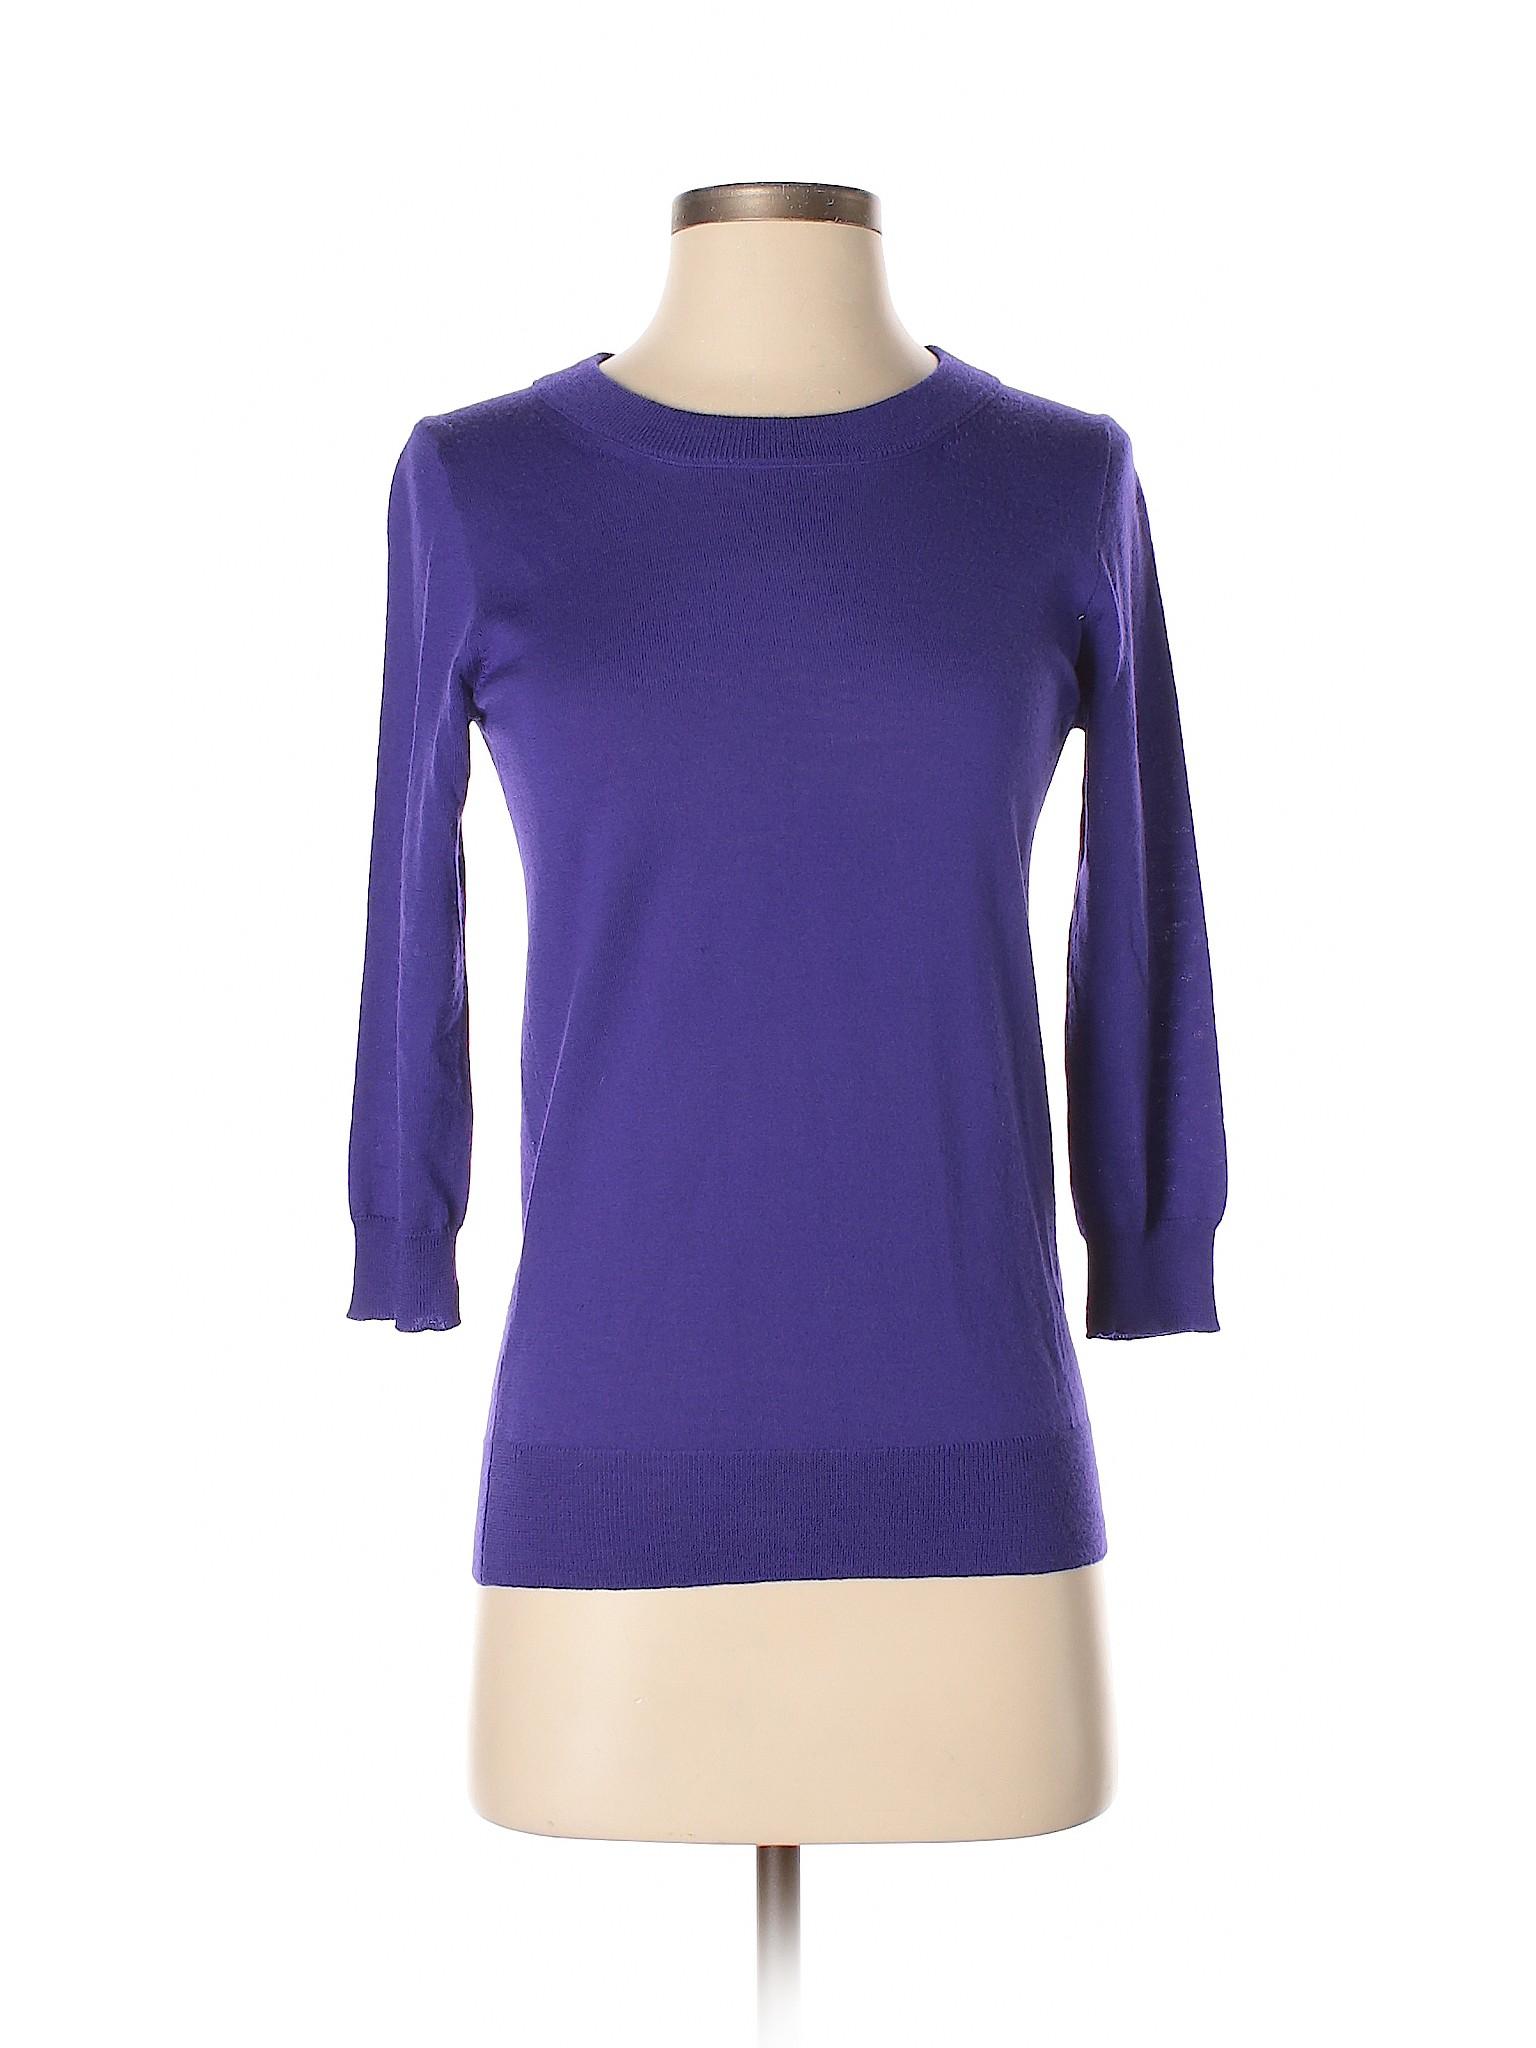 J Crew Wool Pullover Sweater Boutique Winter Eq5w6nZ